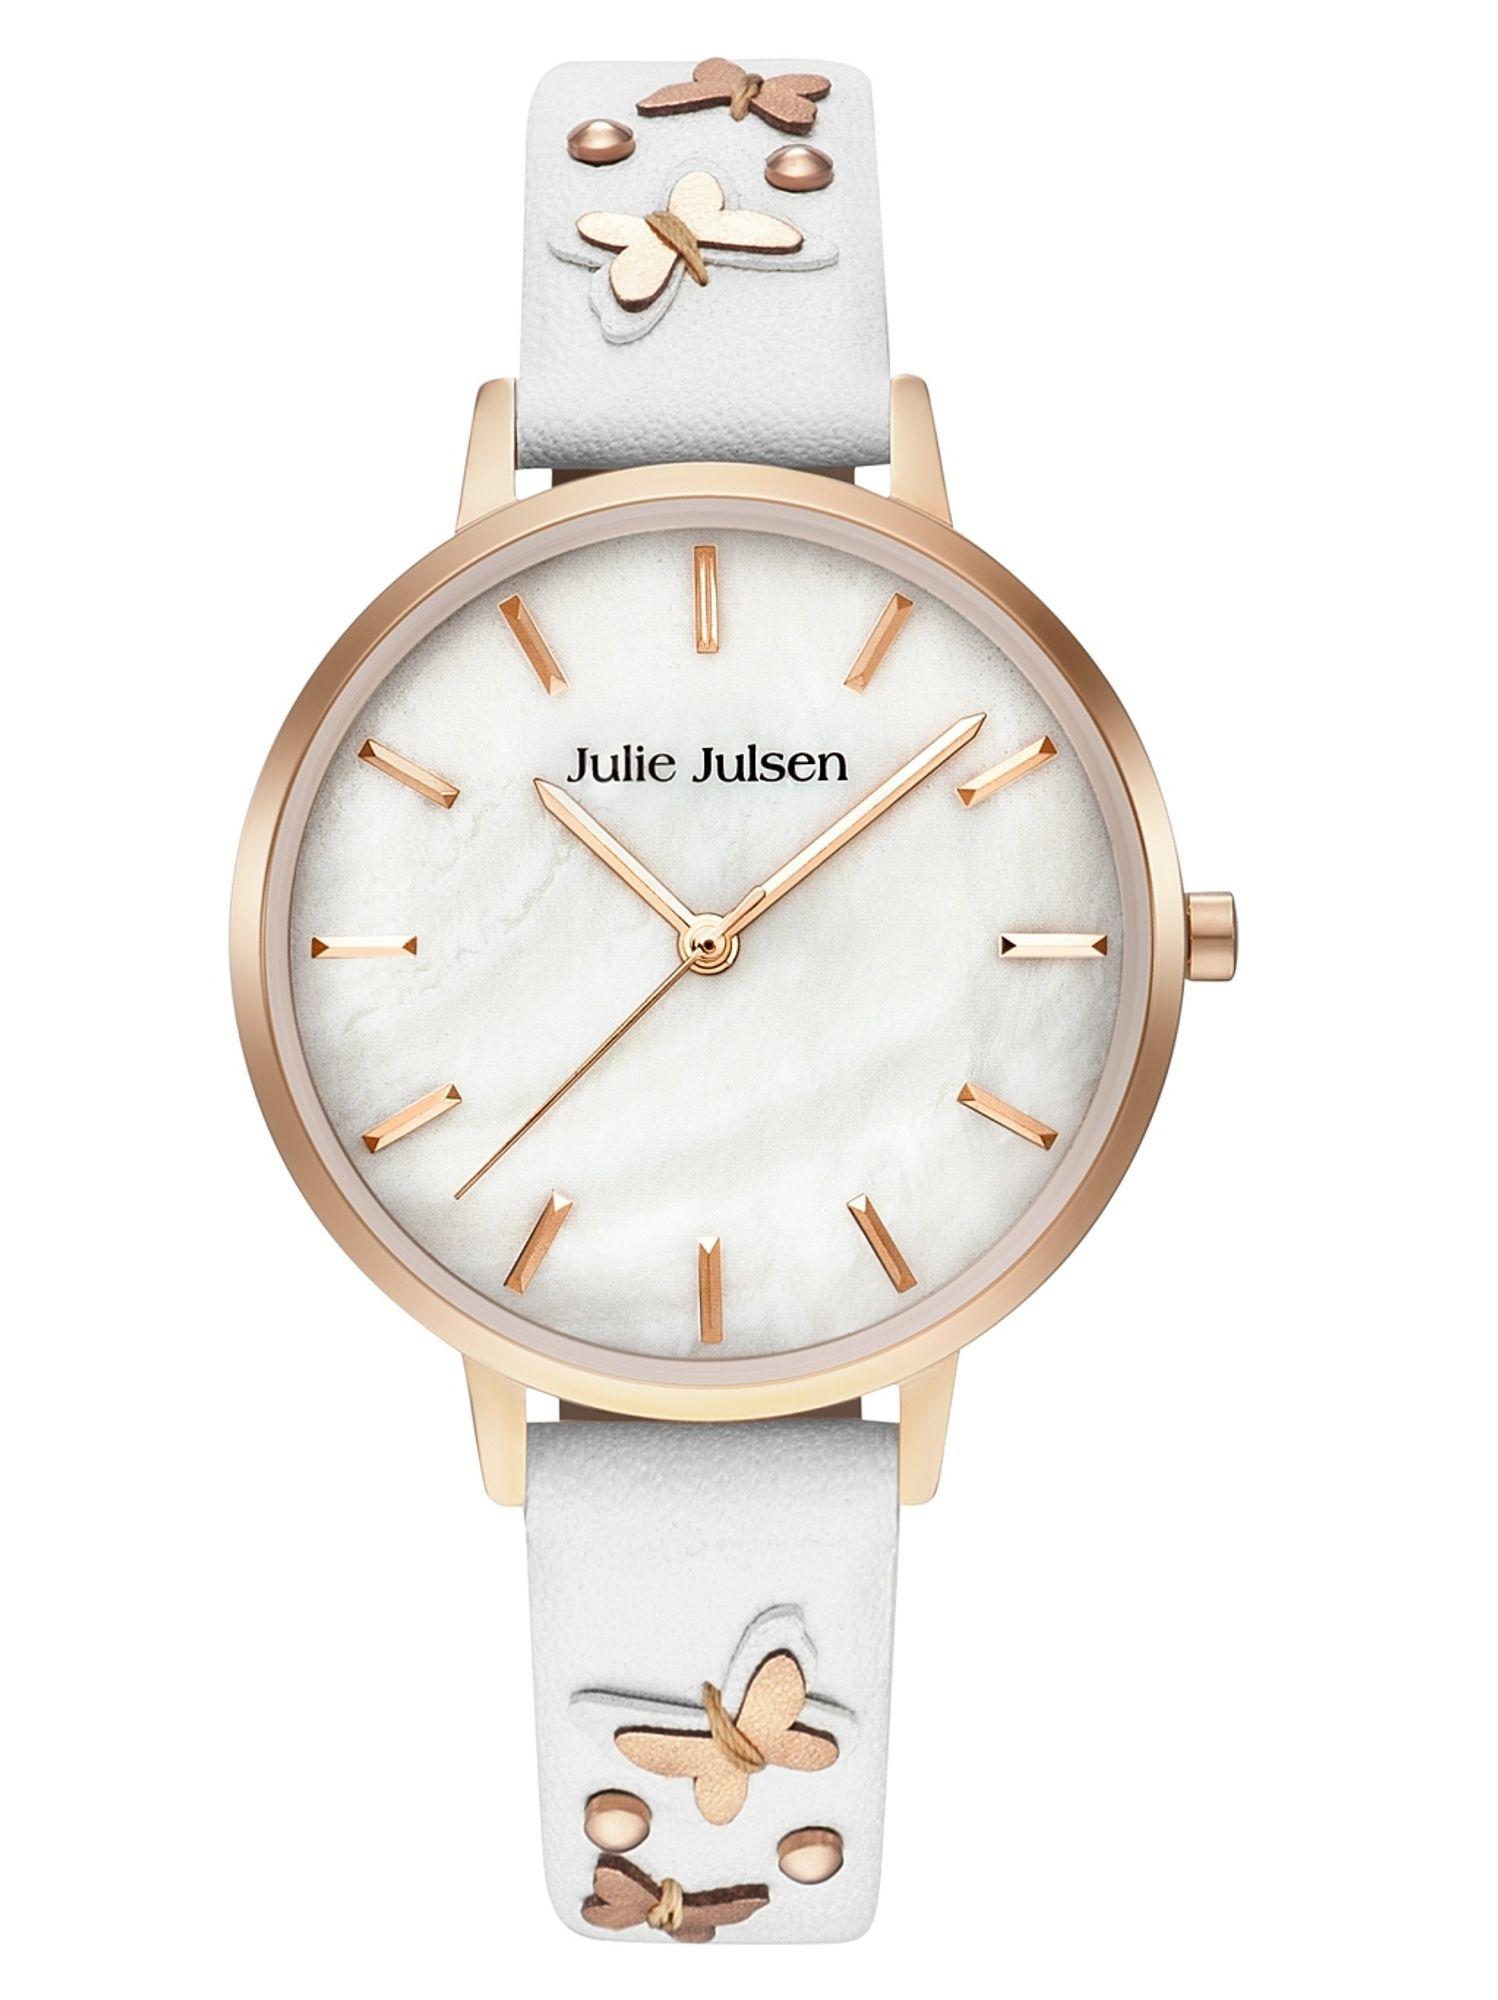 Julie Julsen JJW103RGL-9S Uhr Damenuhr Lederarmband Weiß